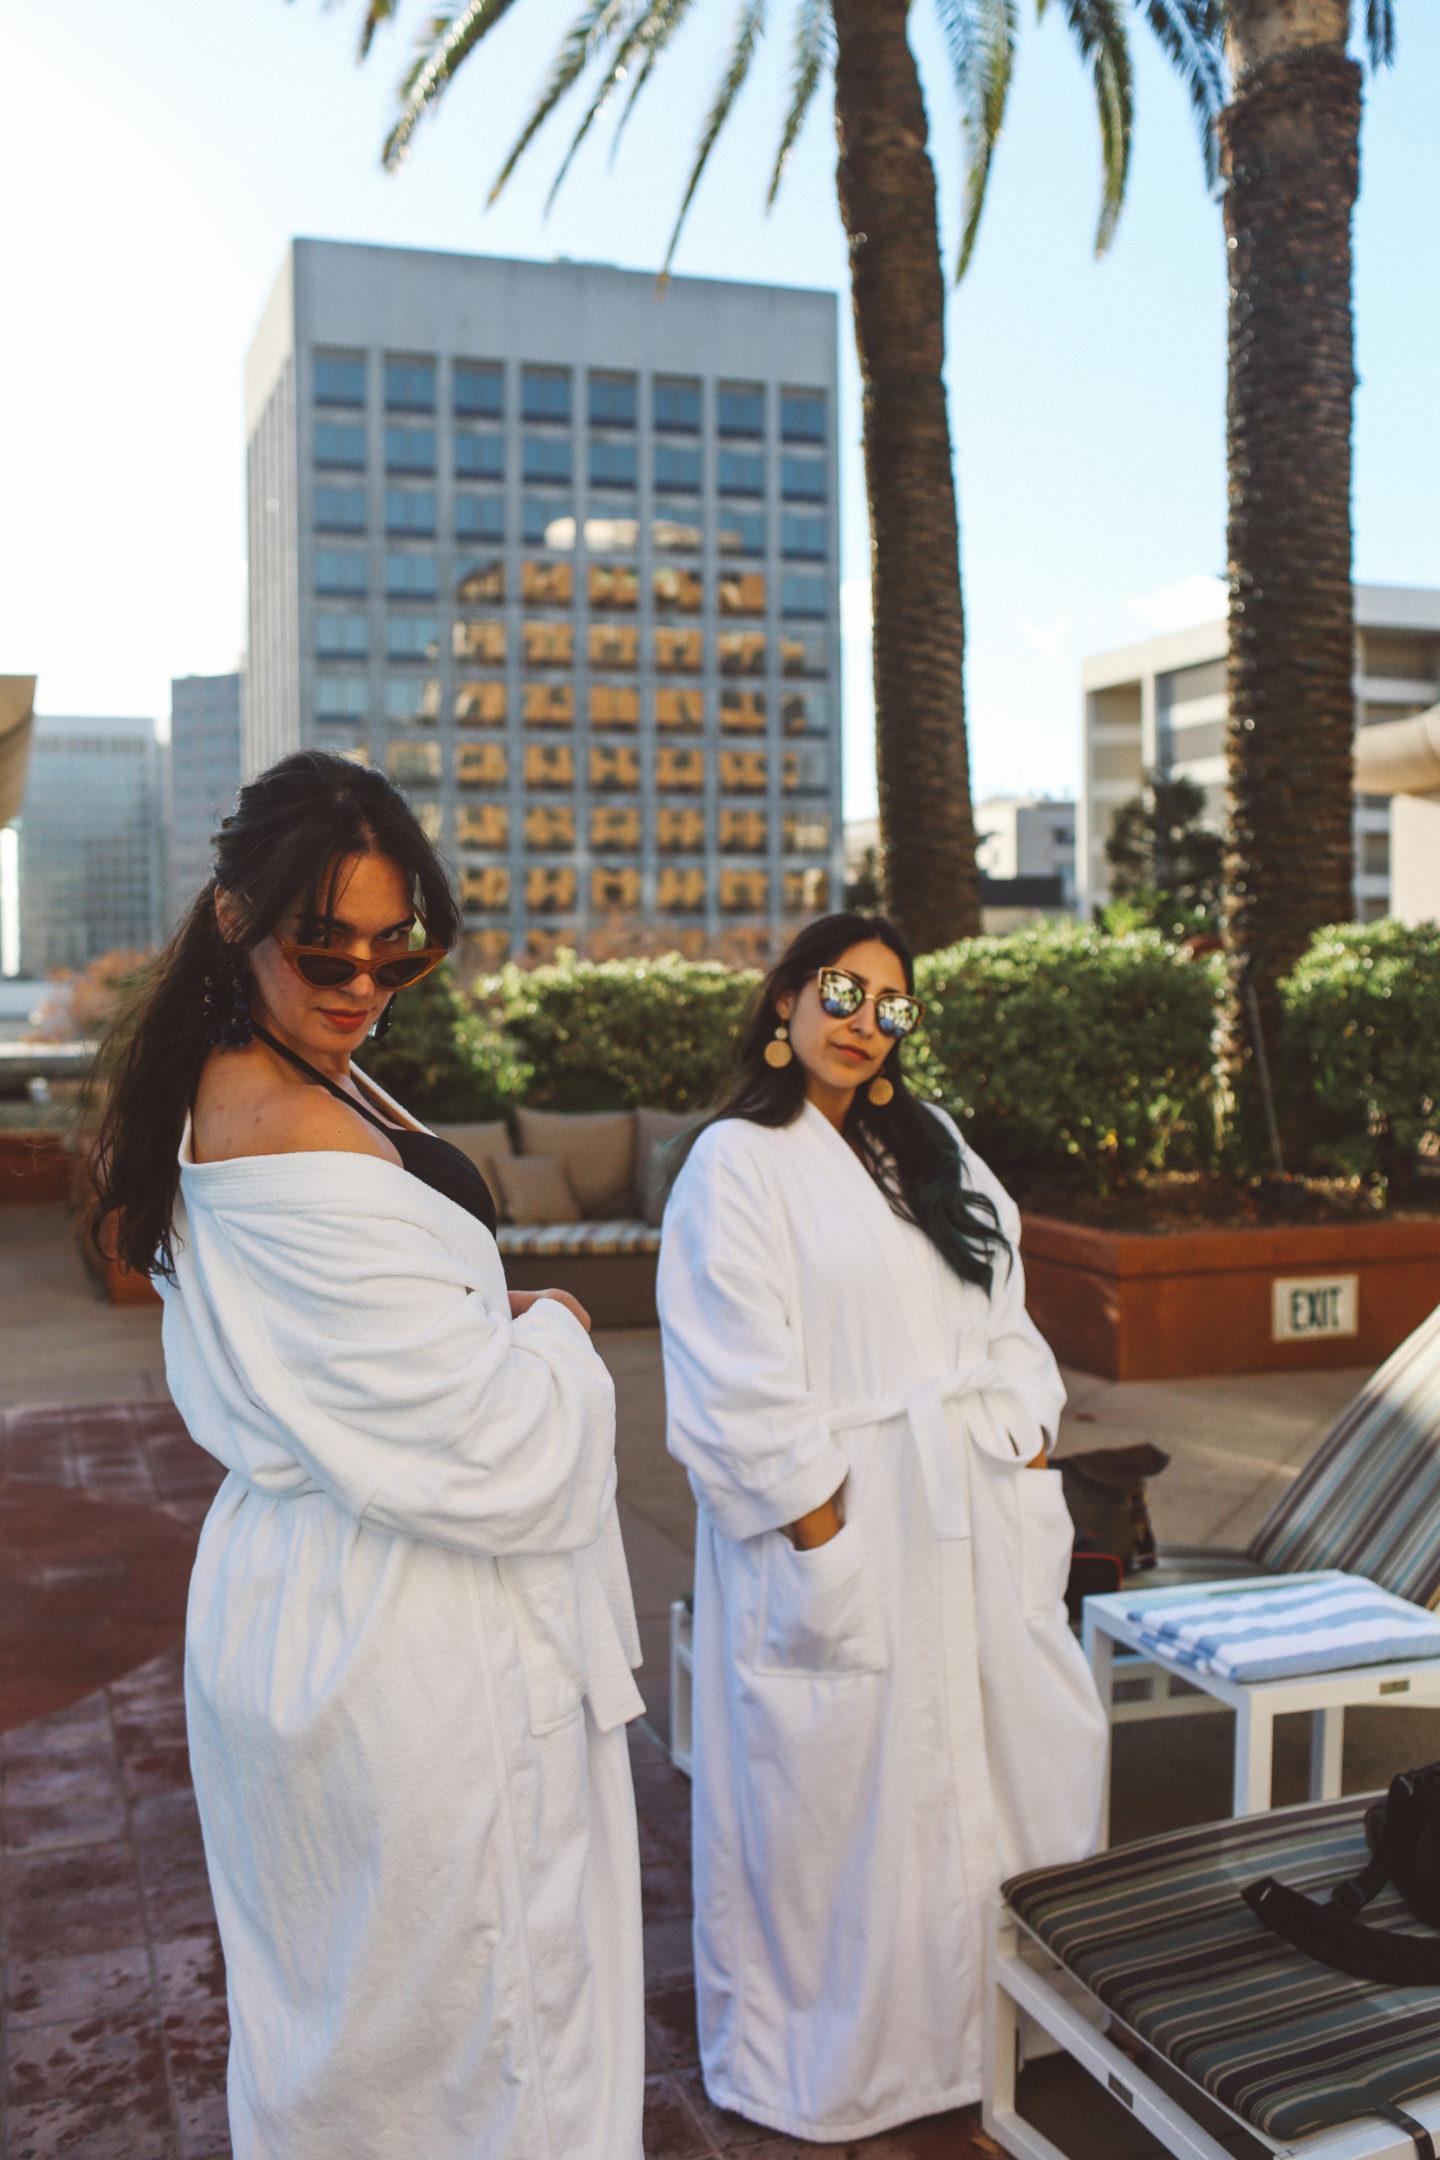 women in robes